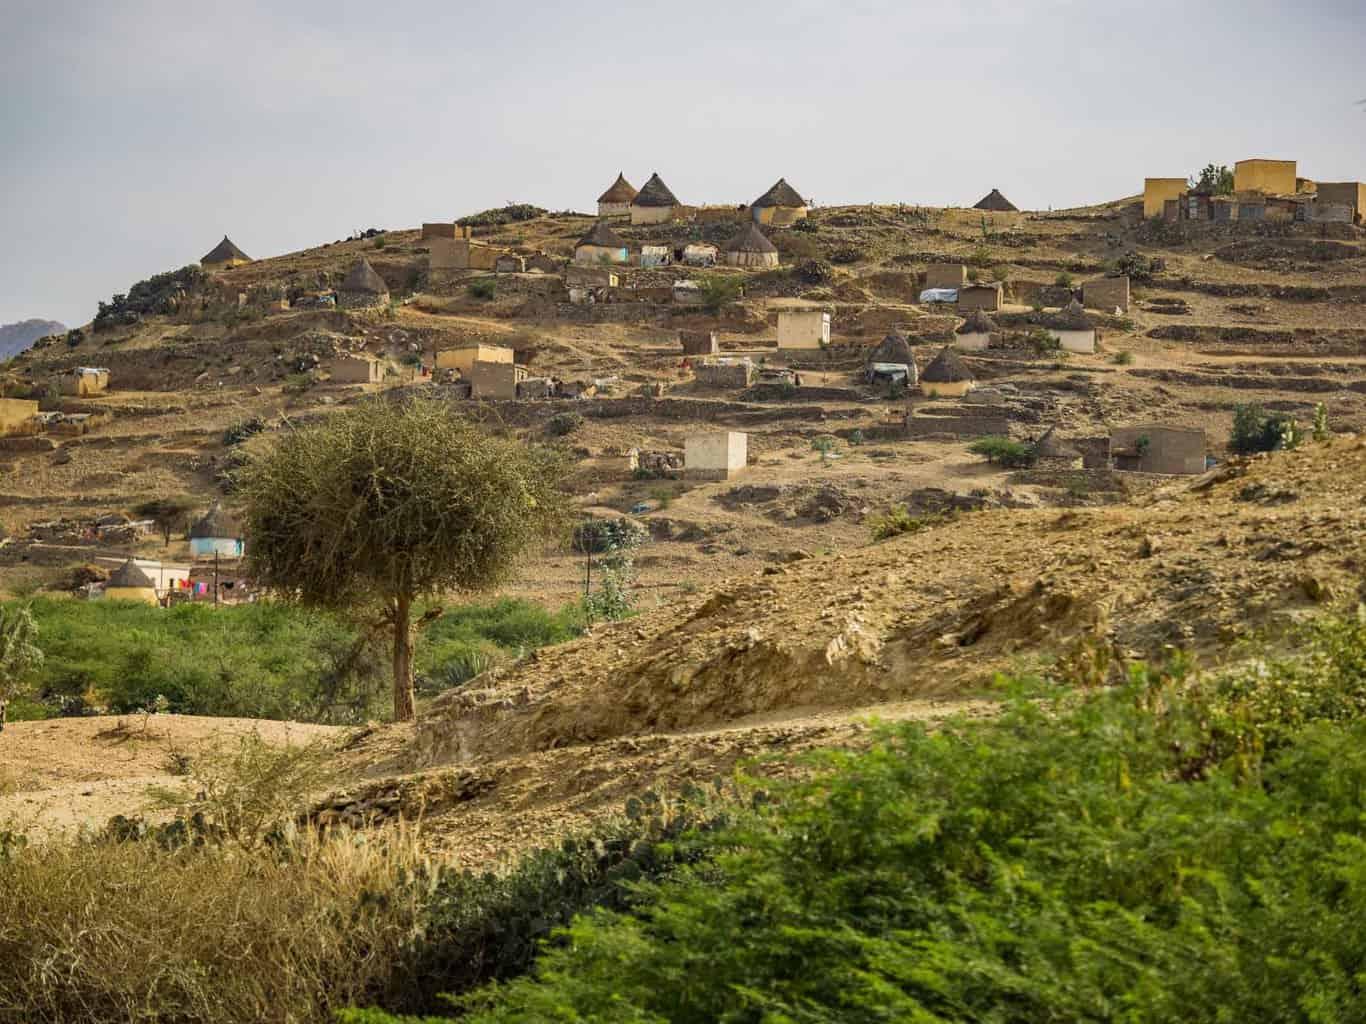 local village in Eritrea